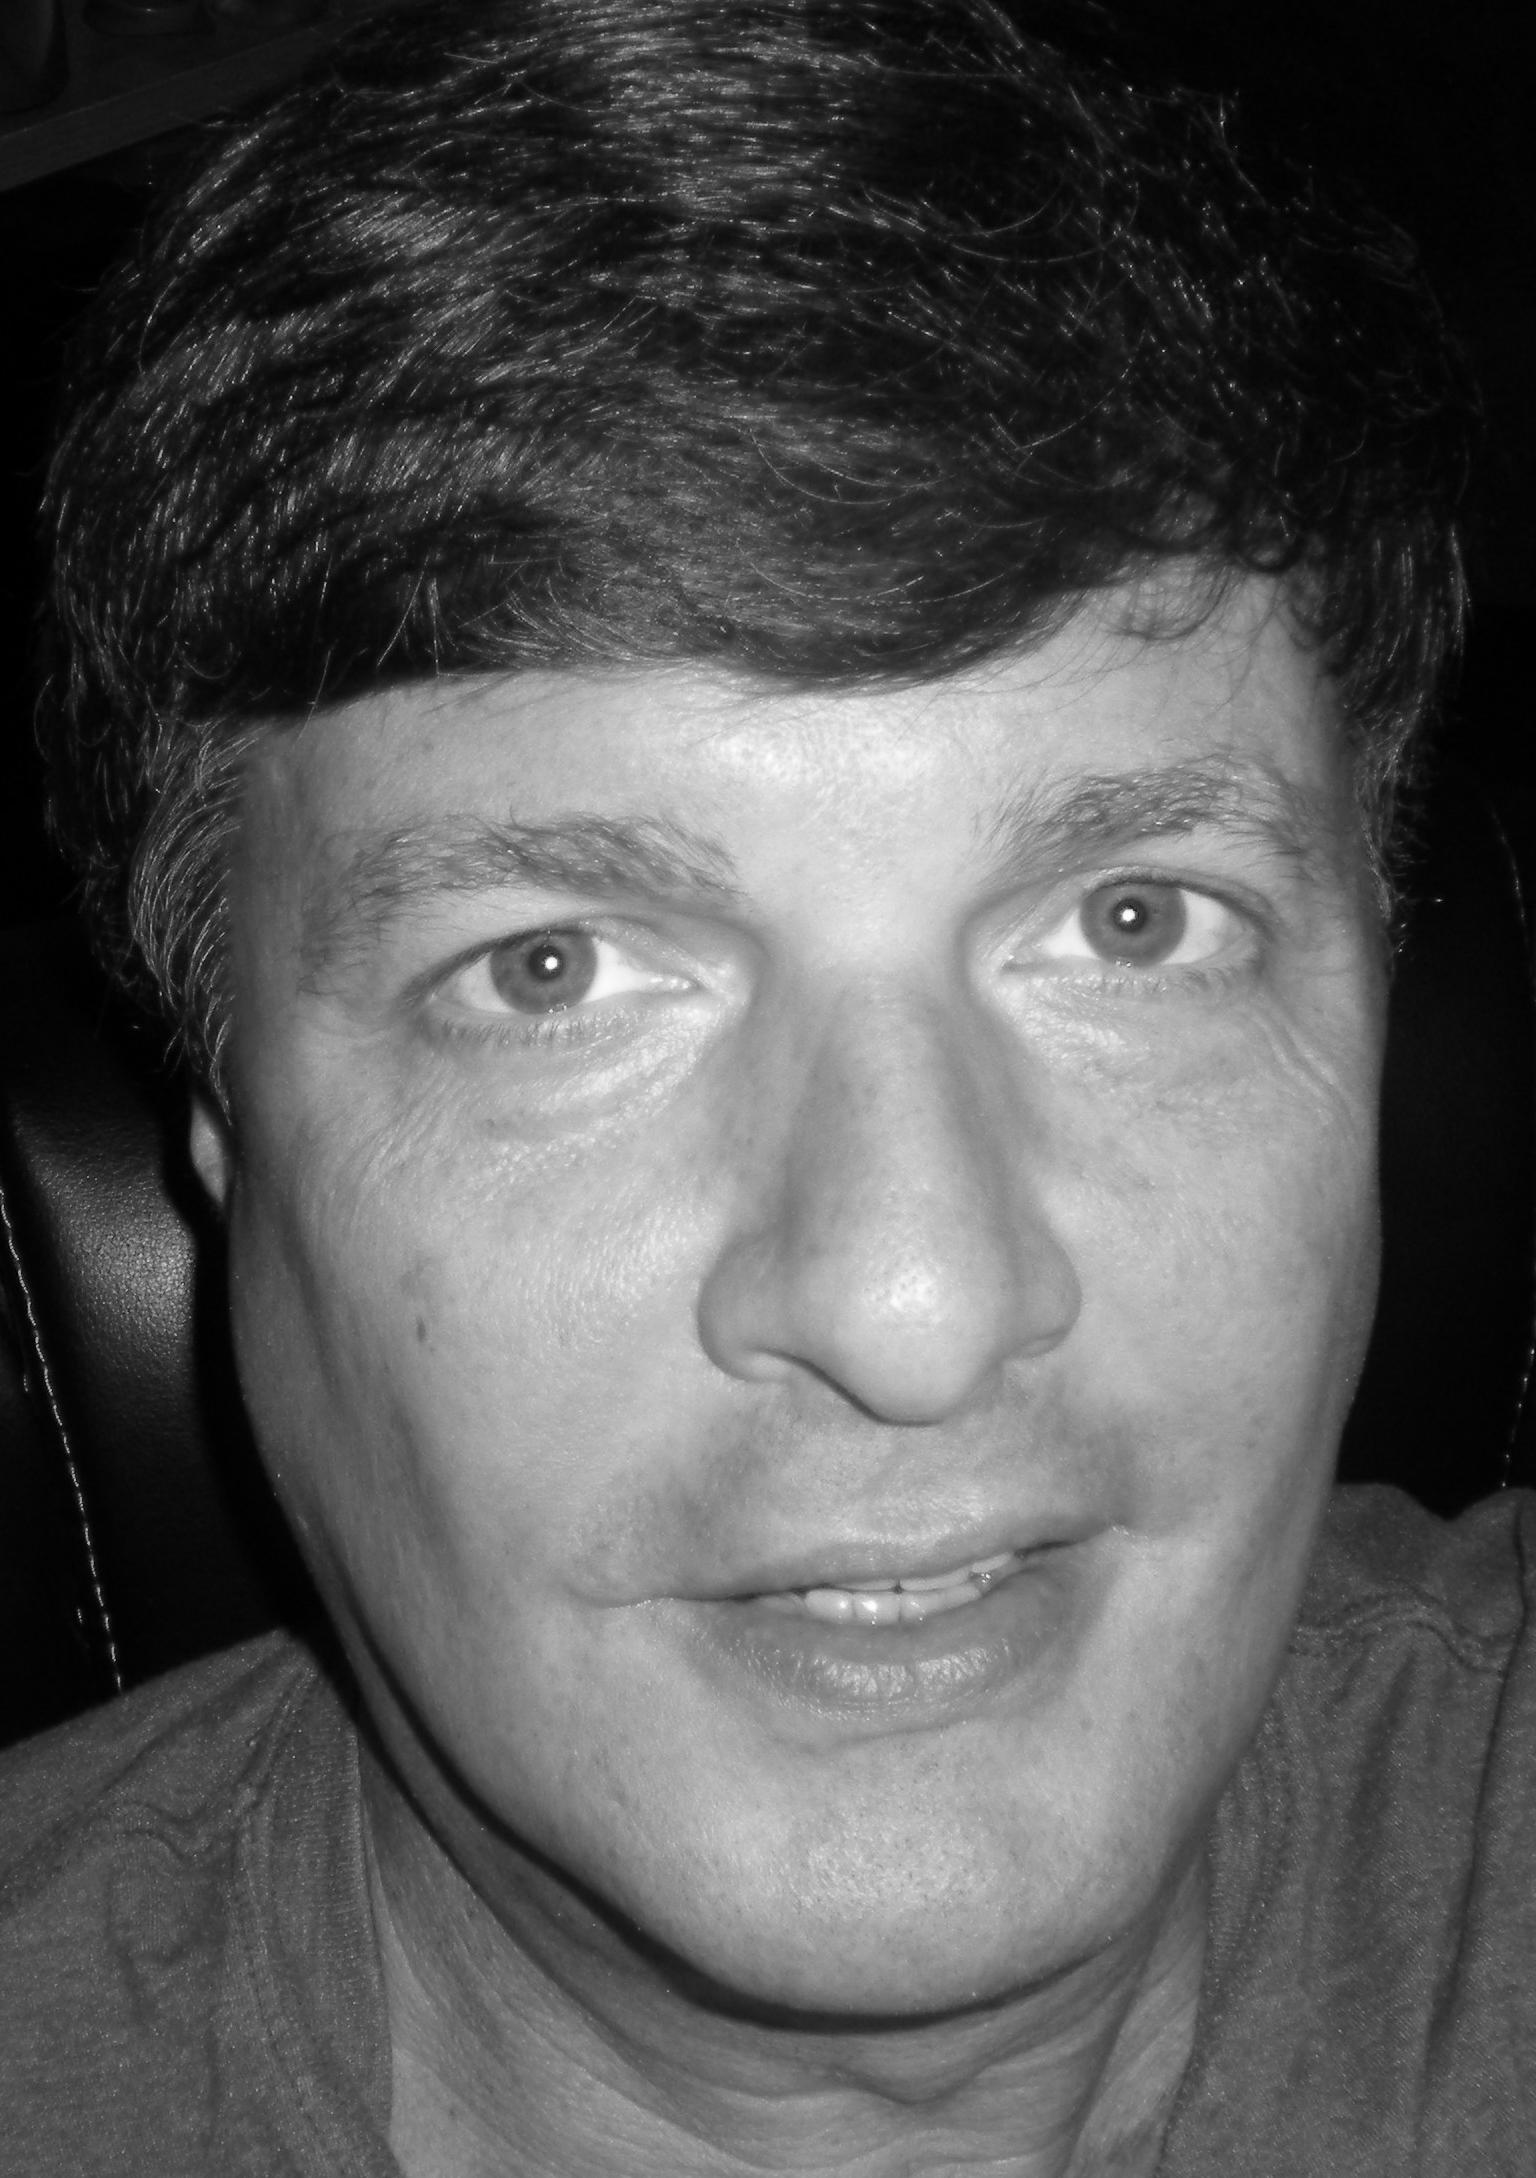 Paul Blake Smith